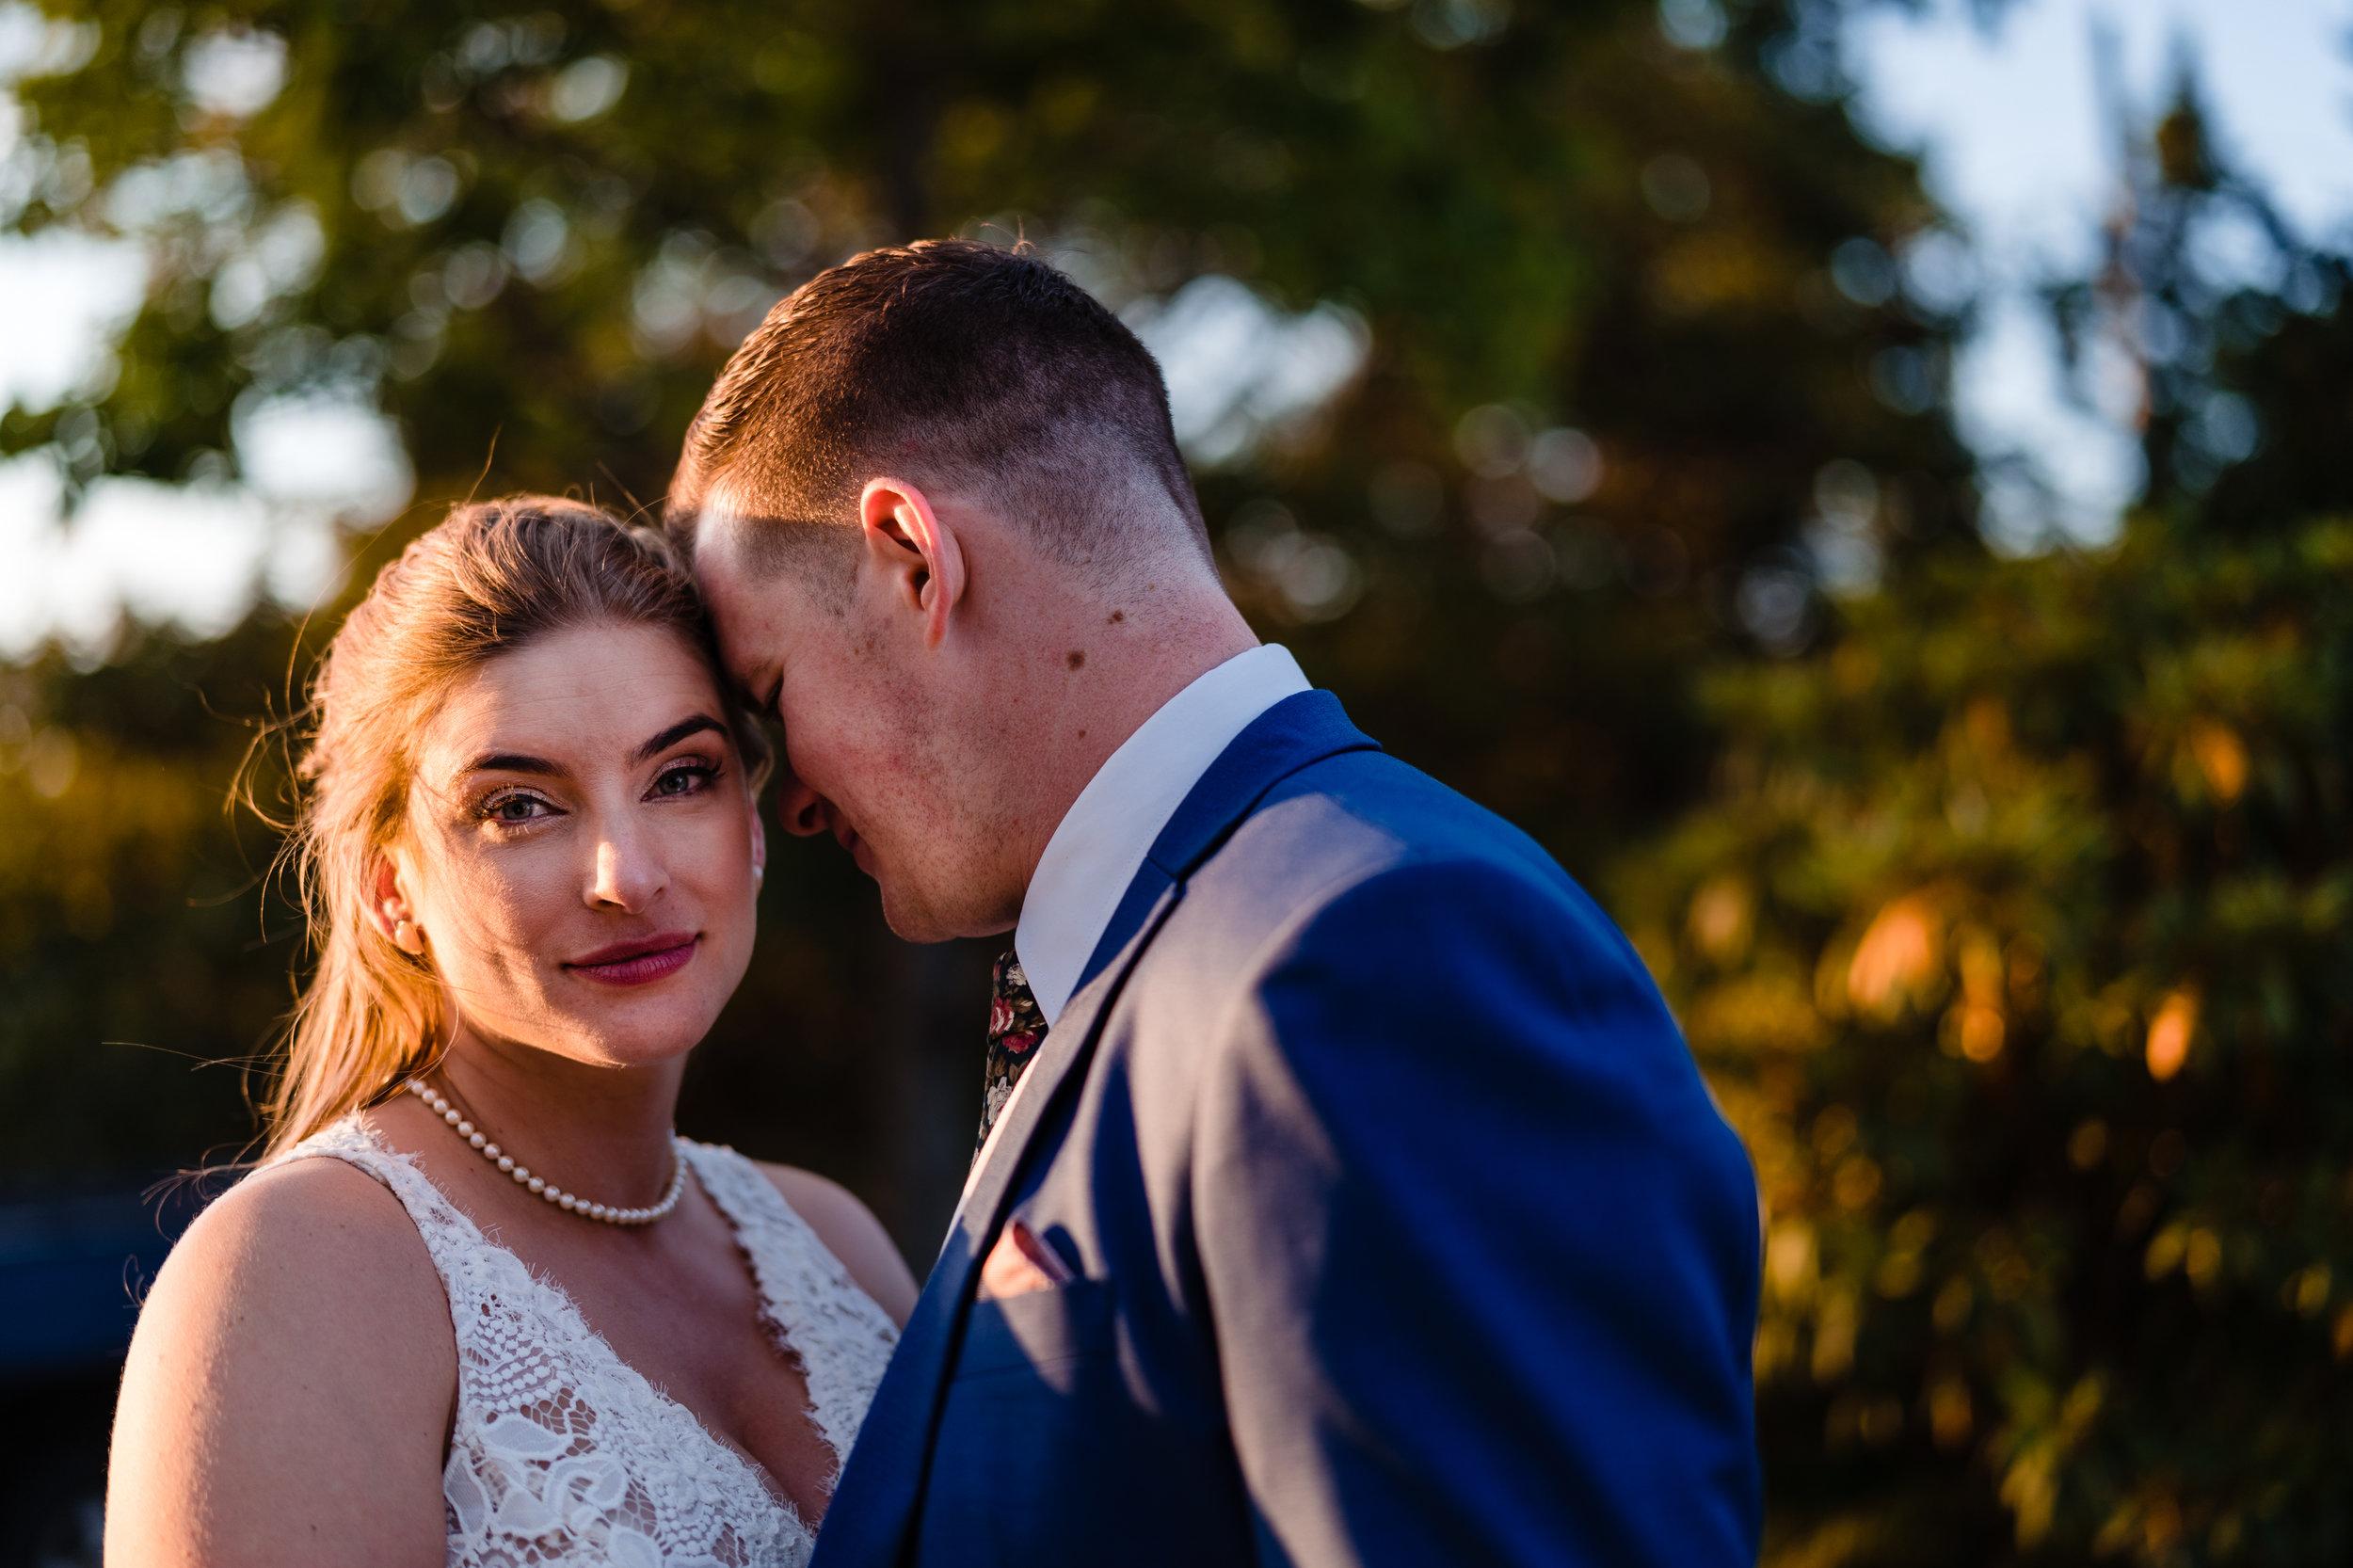 Janelle-Mitch-Halifax-Wedding-Nova-Scotia-Photography (135 of 163).jpg